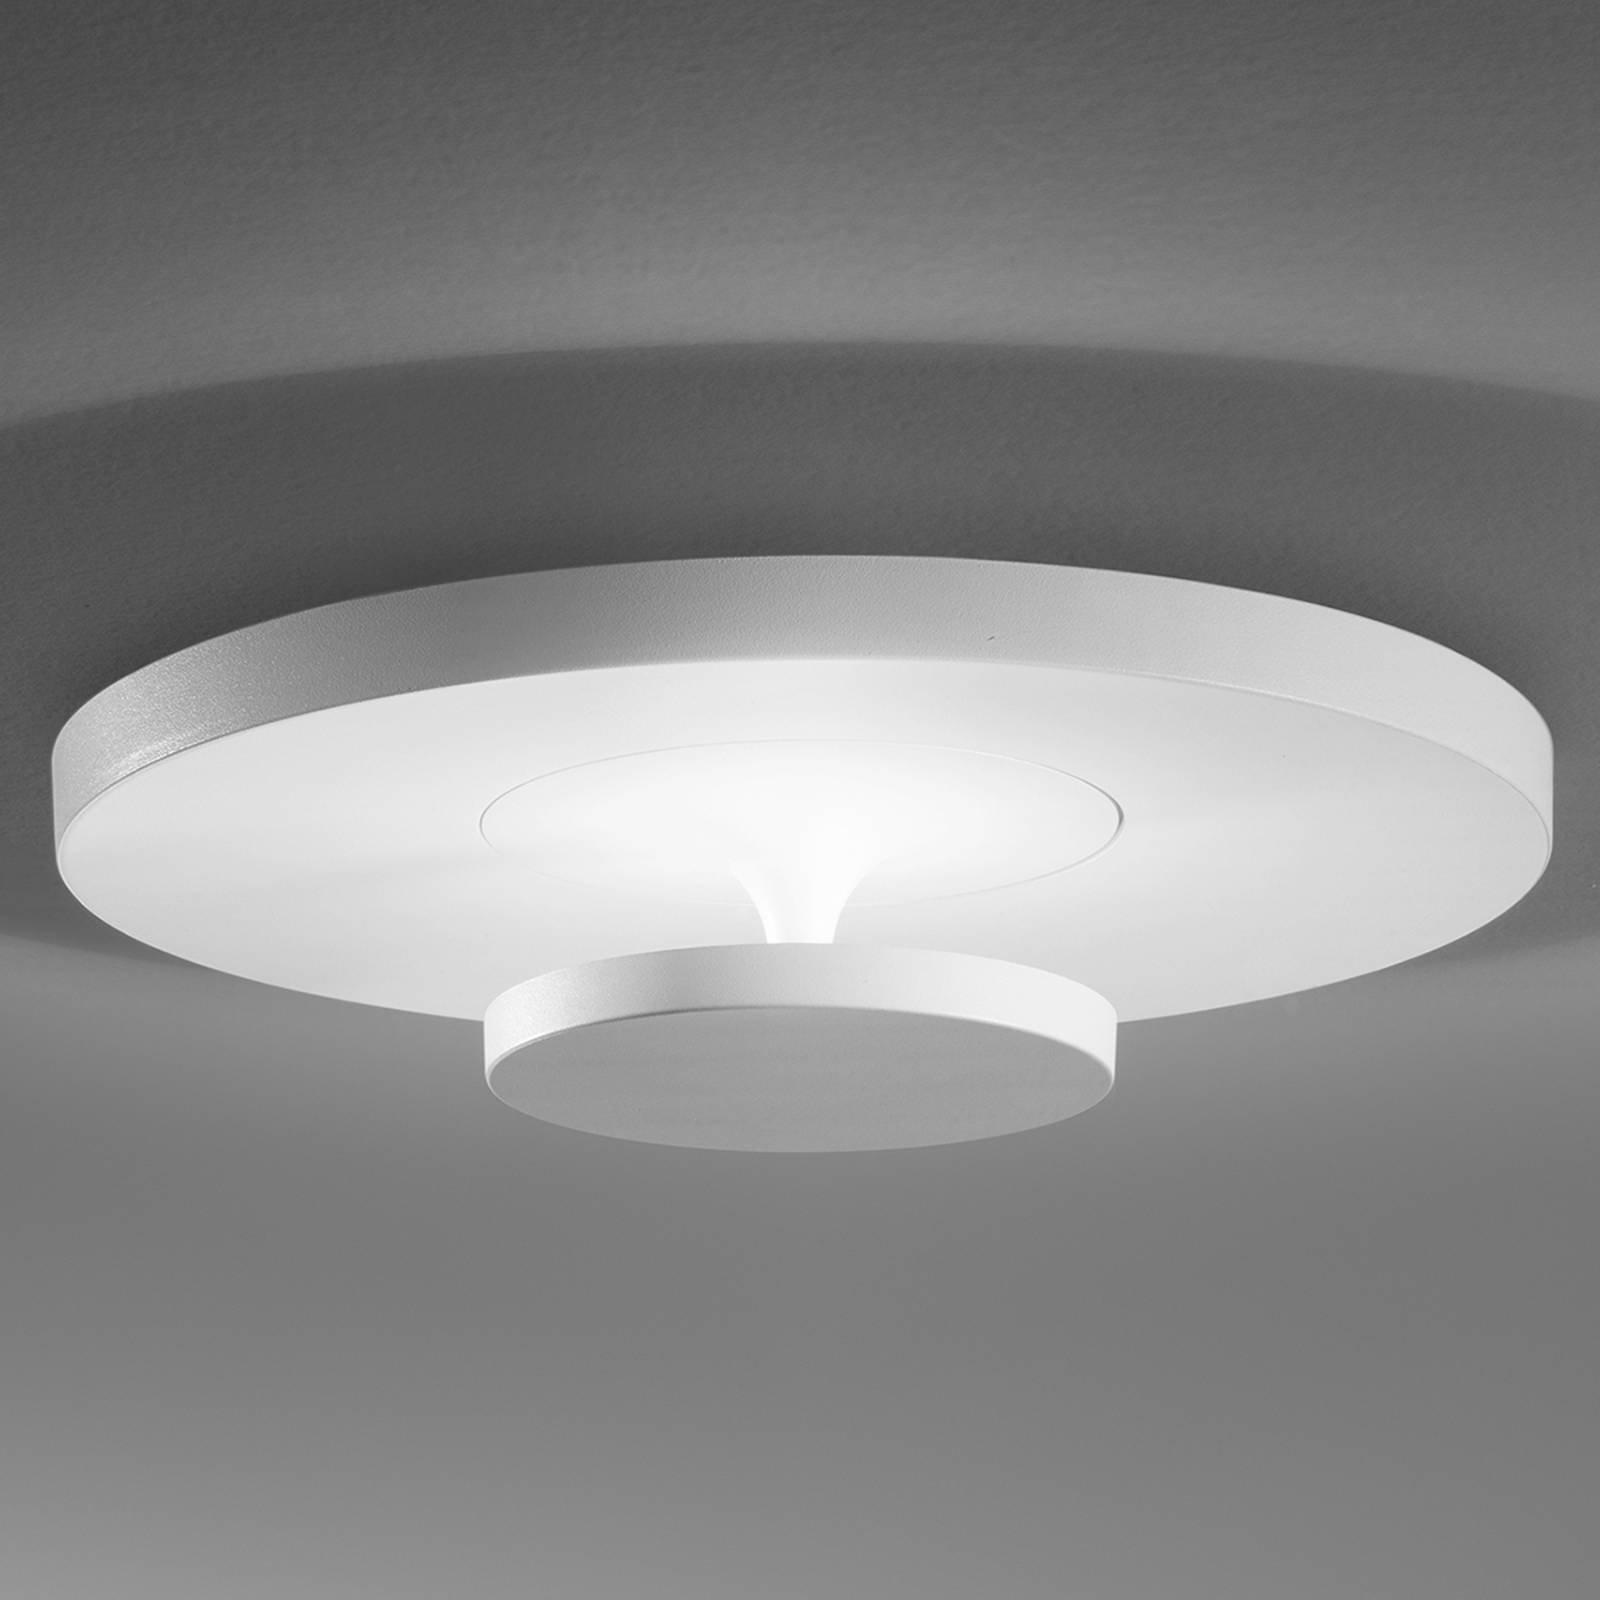 LED-taklampe Sunny med indirekte lys